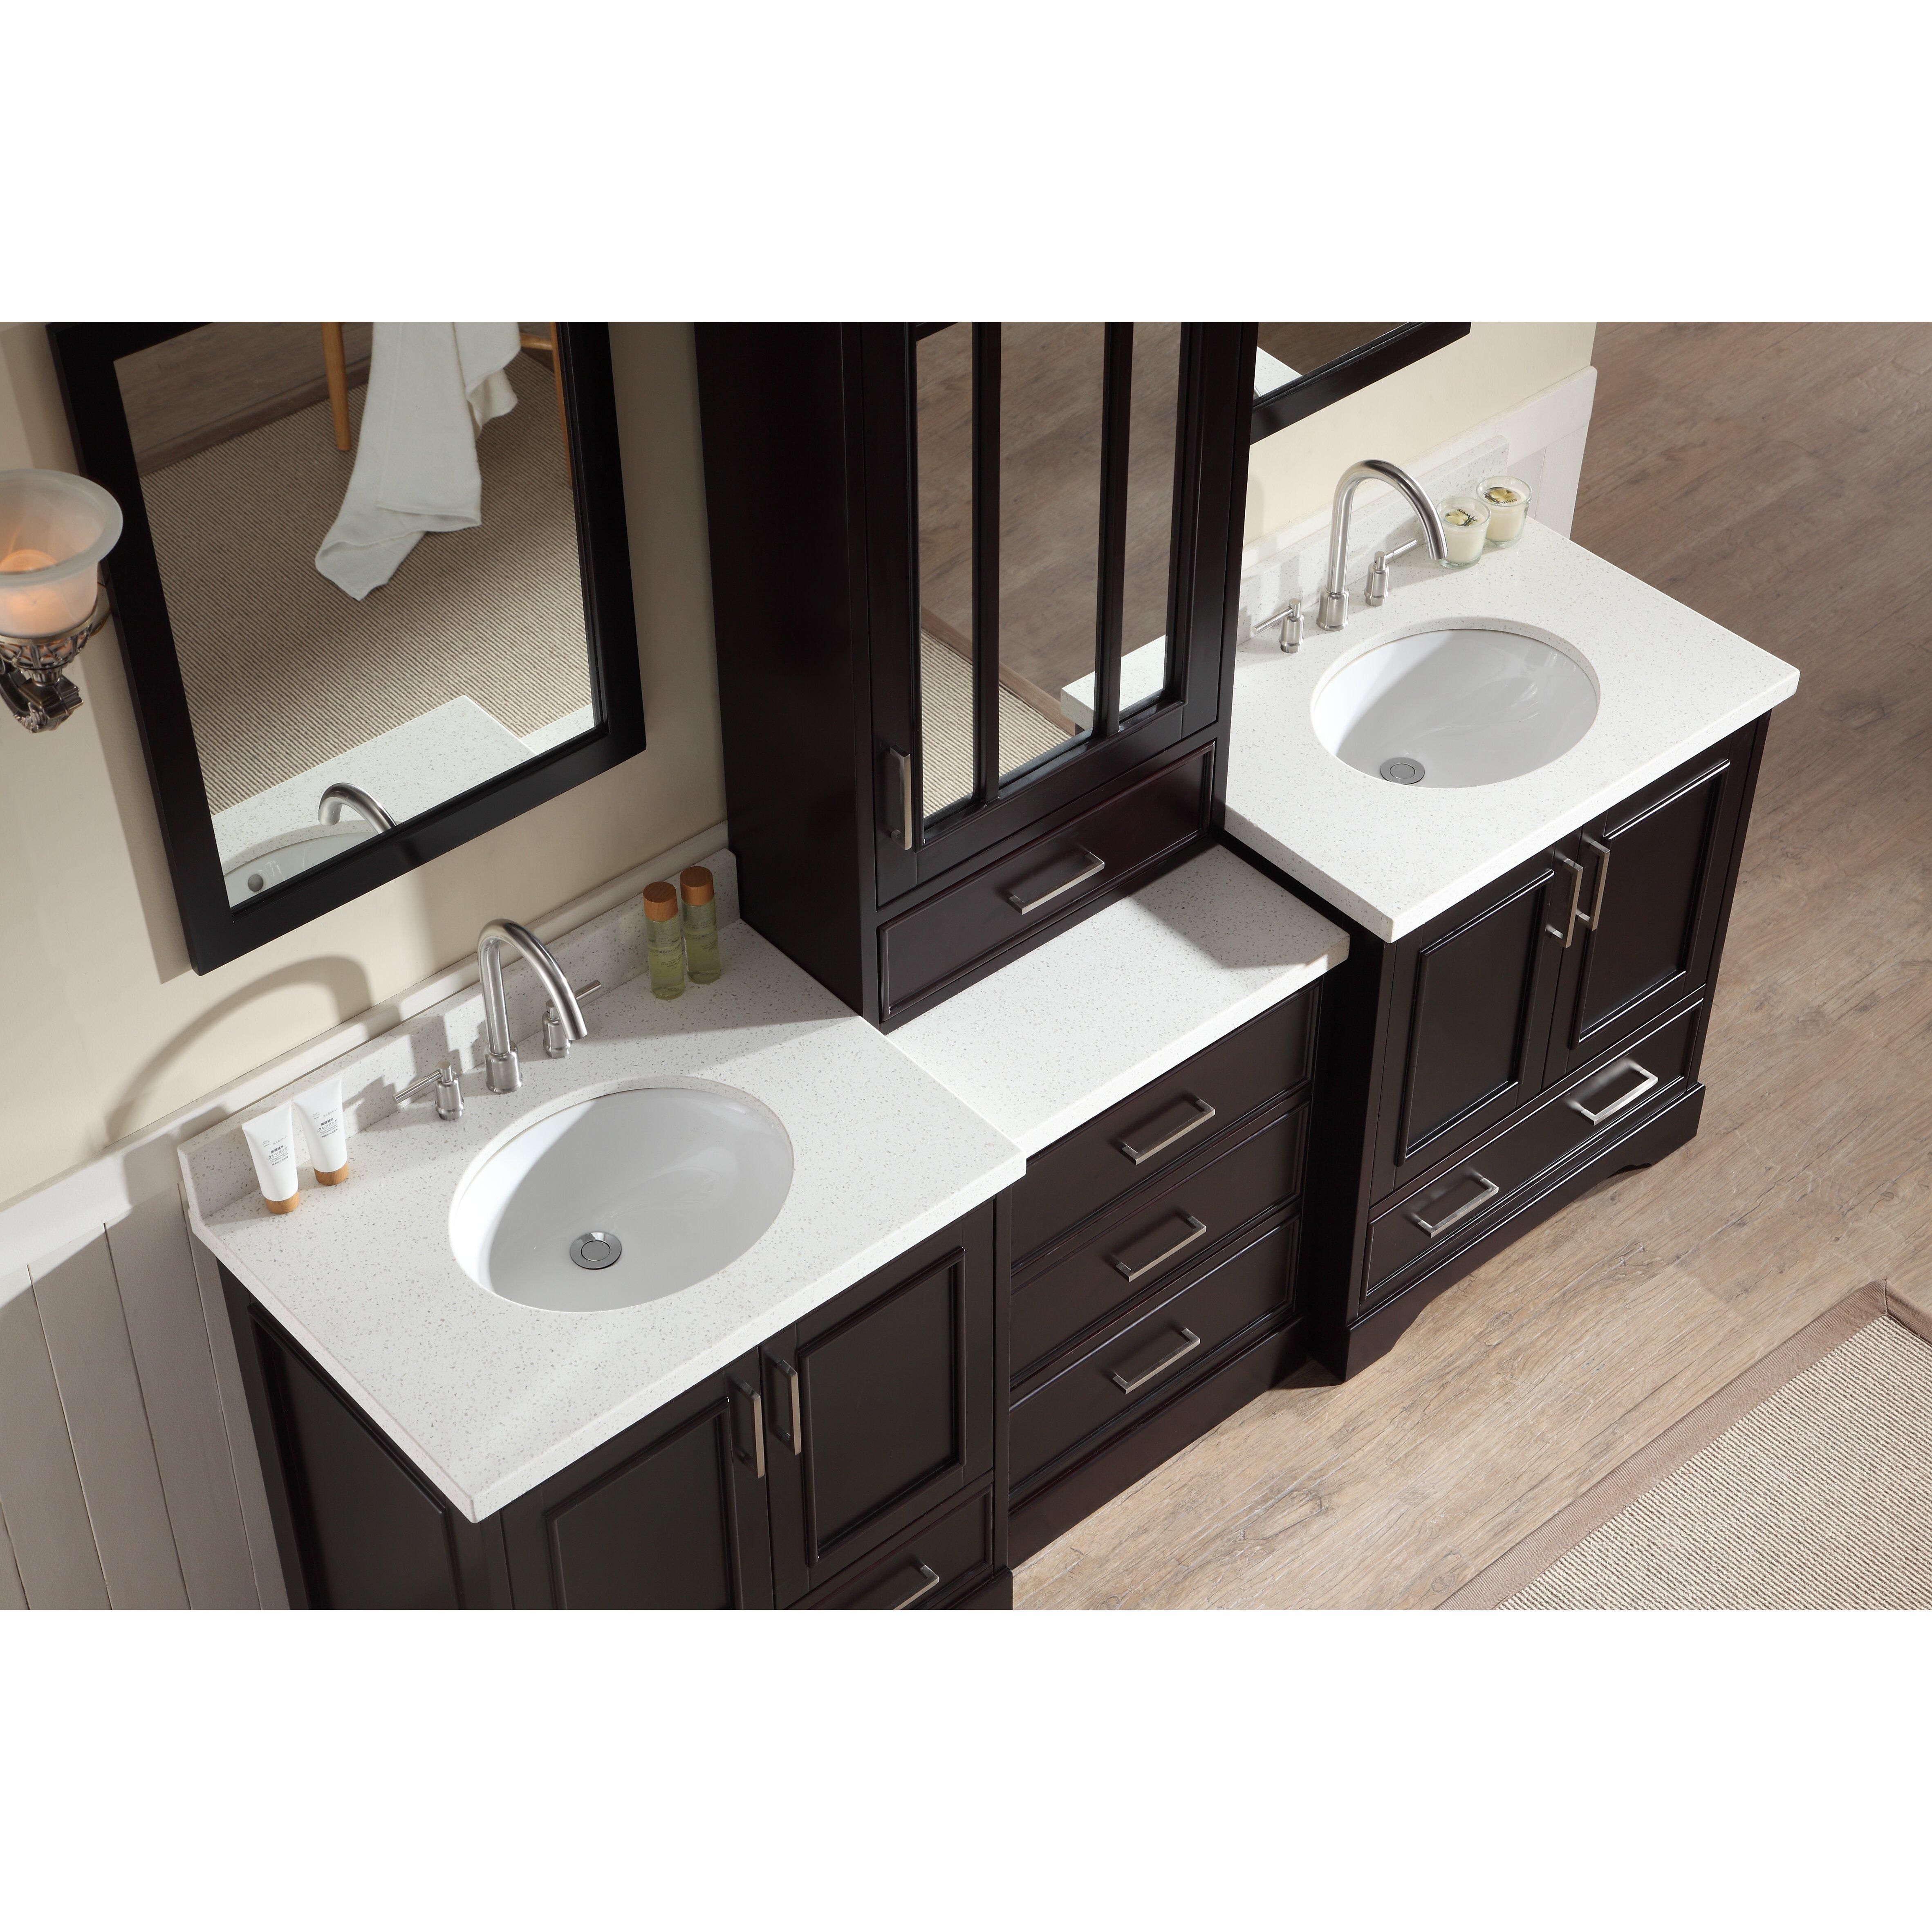 ariel bath stafford 85 double sink vanity set with mirror ba